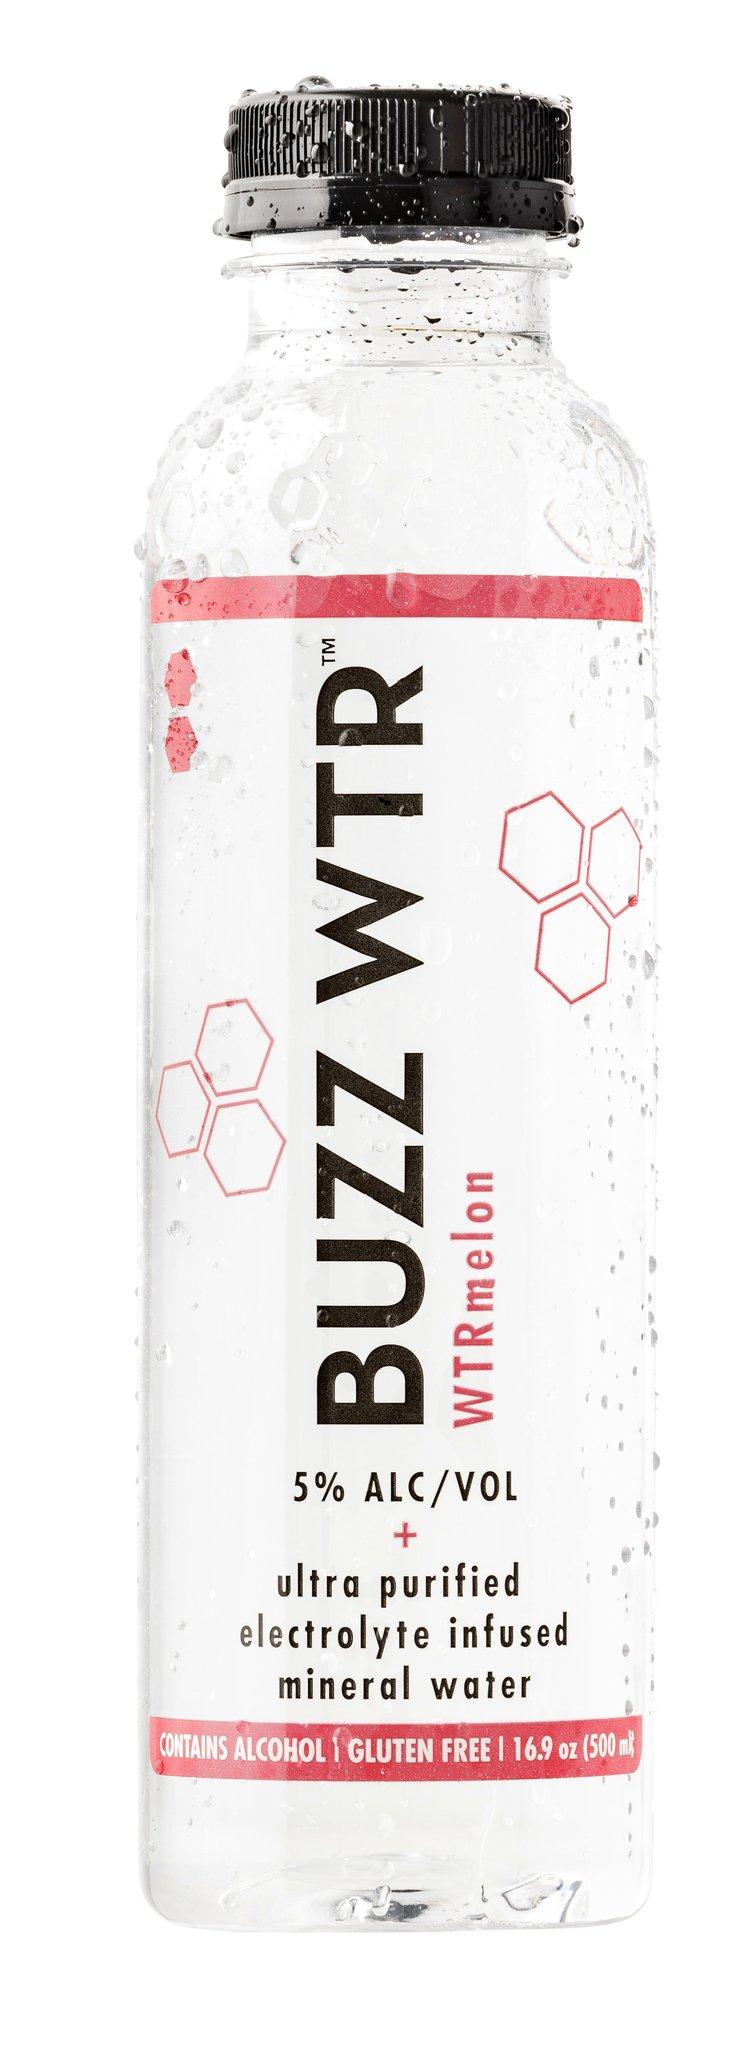 Buzz Wtr Watermelon, Where to buy Buzz Wtr, Order Buzz Wtr online, Buzz Wtr Gifts, Send Buzz Wtr, Alcoholic Water, Alcoholic Seltzer